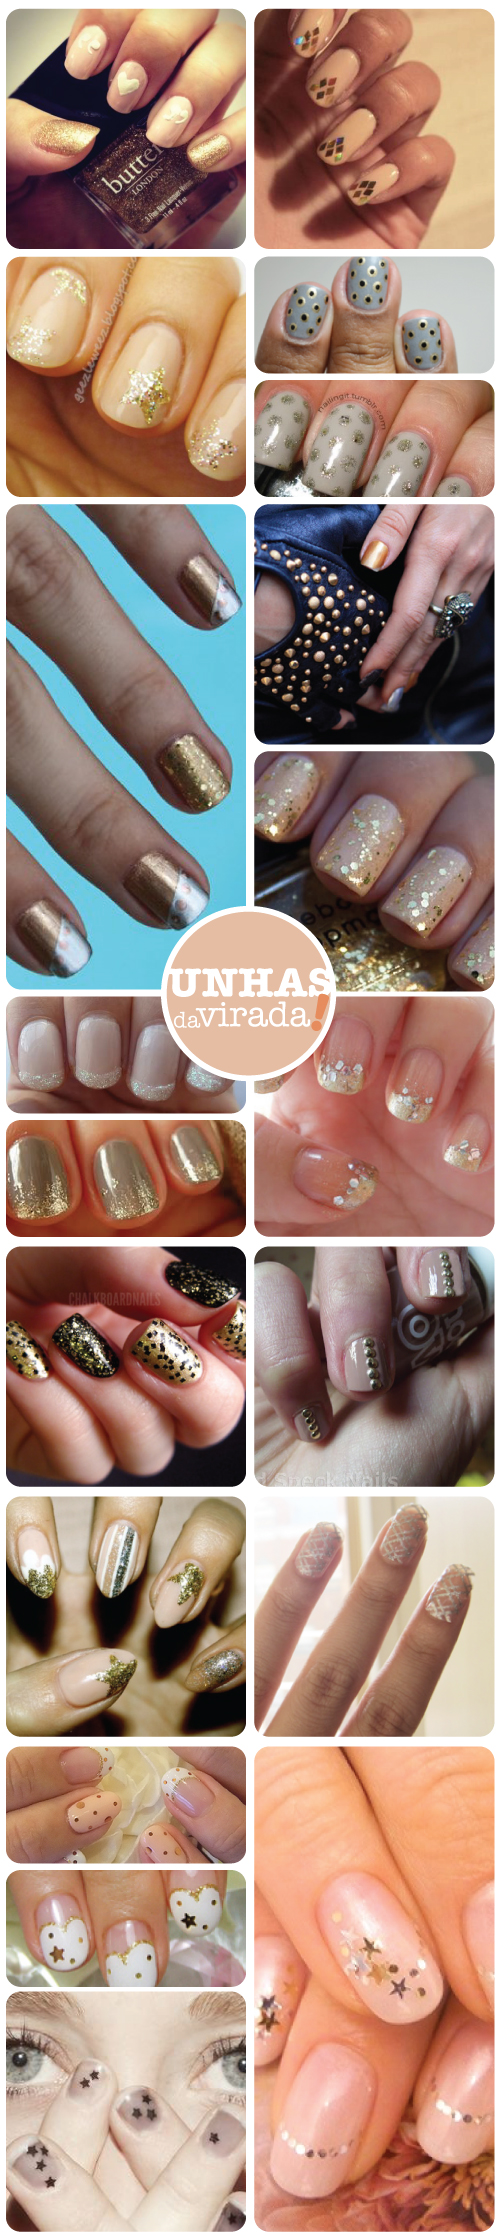 Unhas - Nails | Nails i love | Pinterest